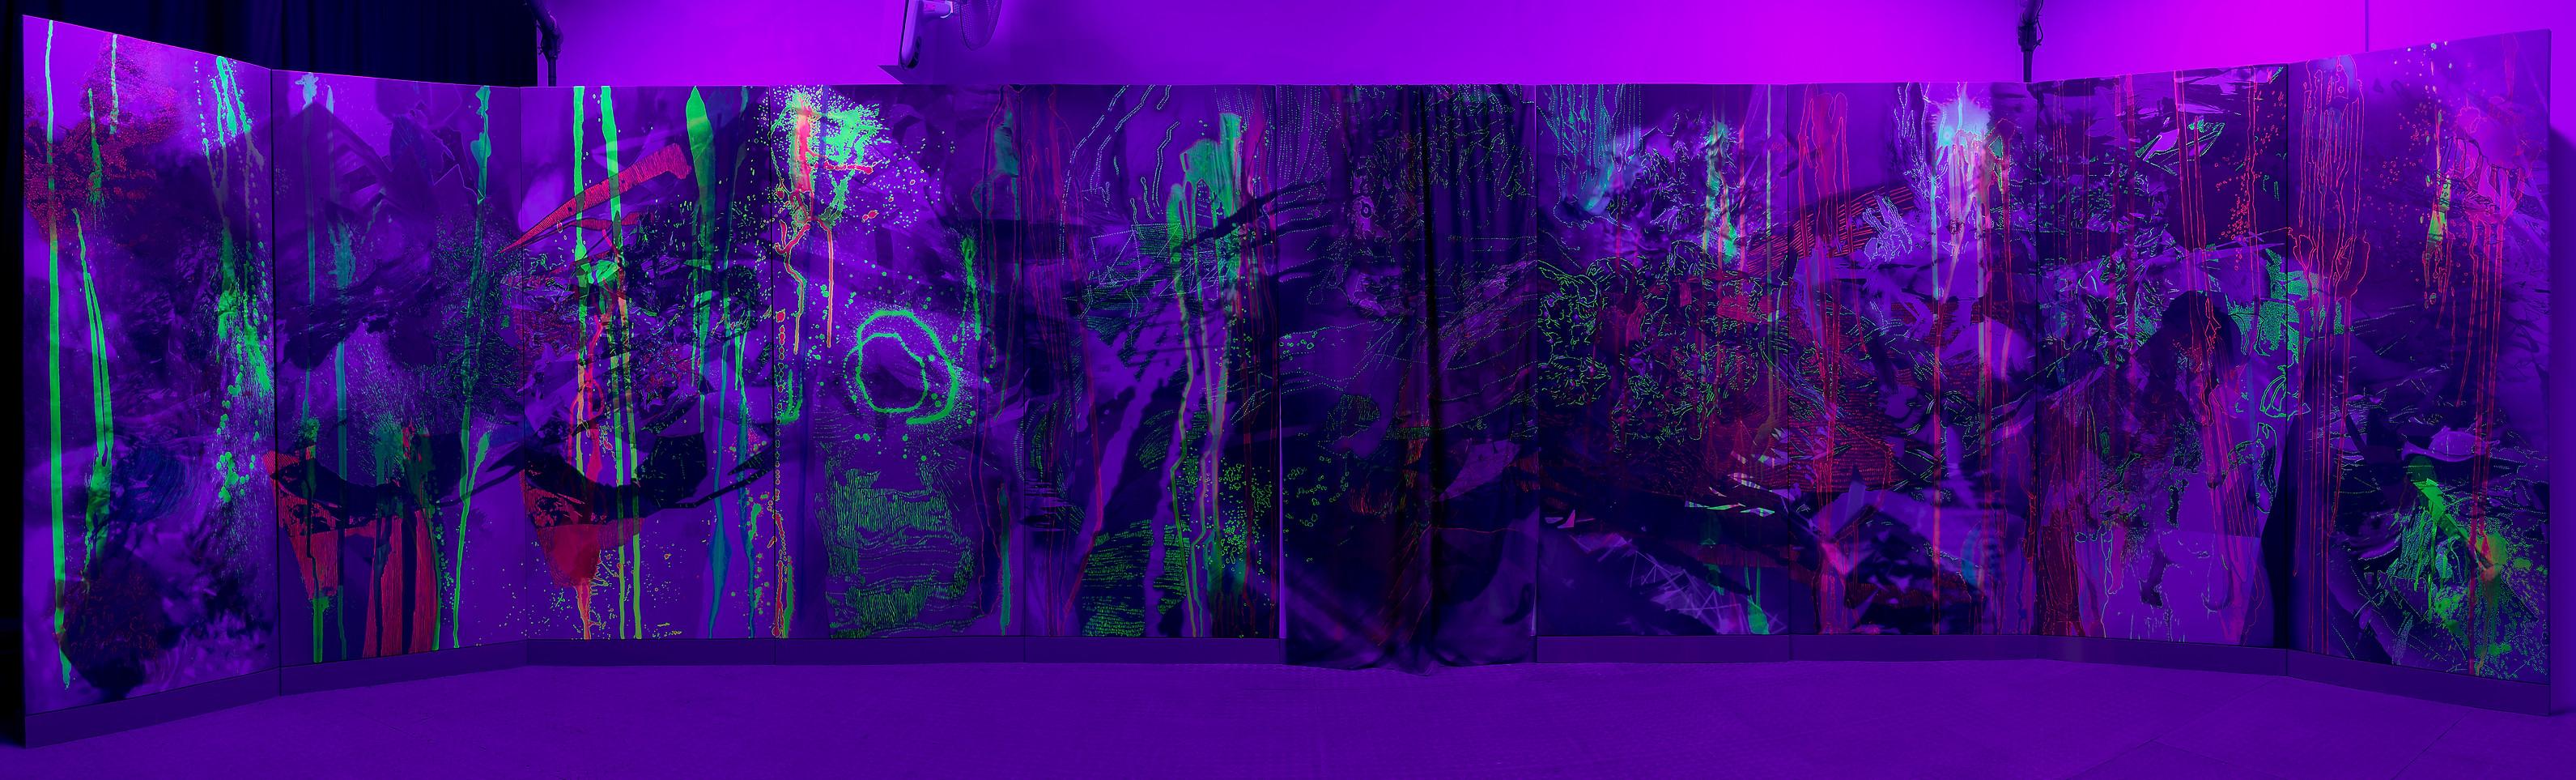 UV Grotto Panels 1-10 decaptych